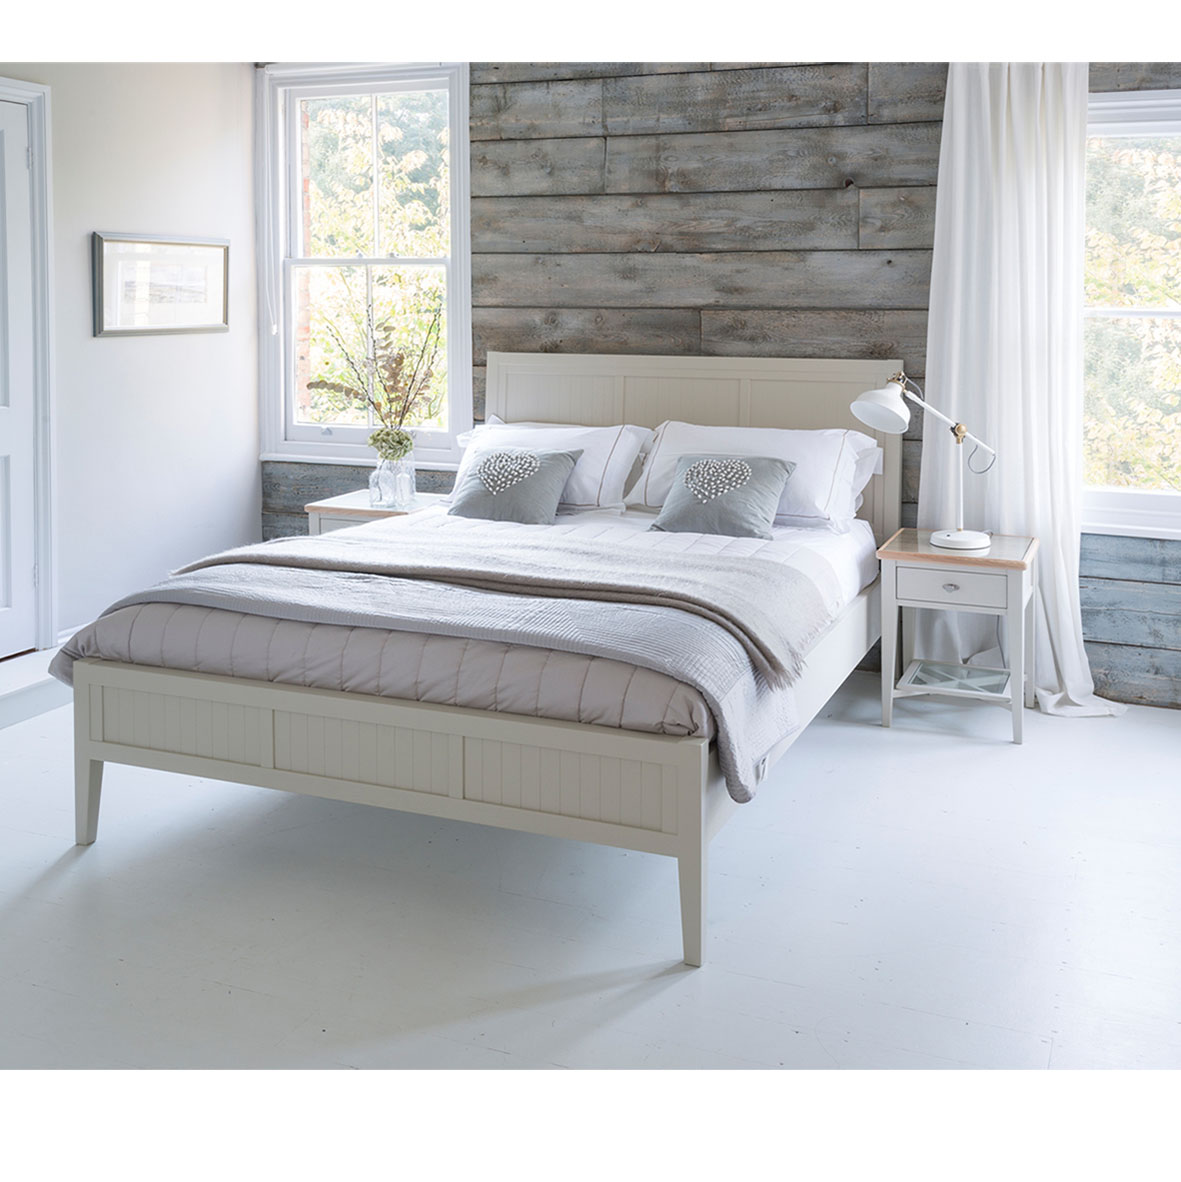 Coast Bed - 150cm